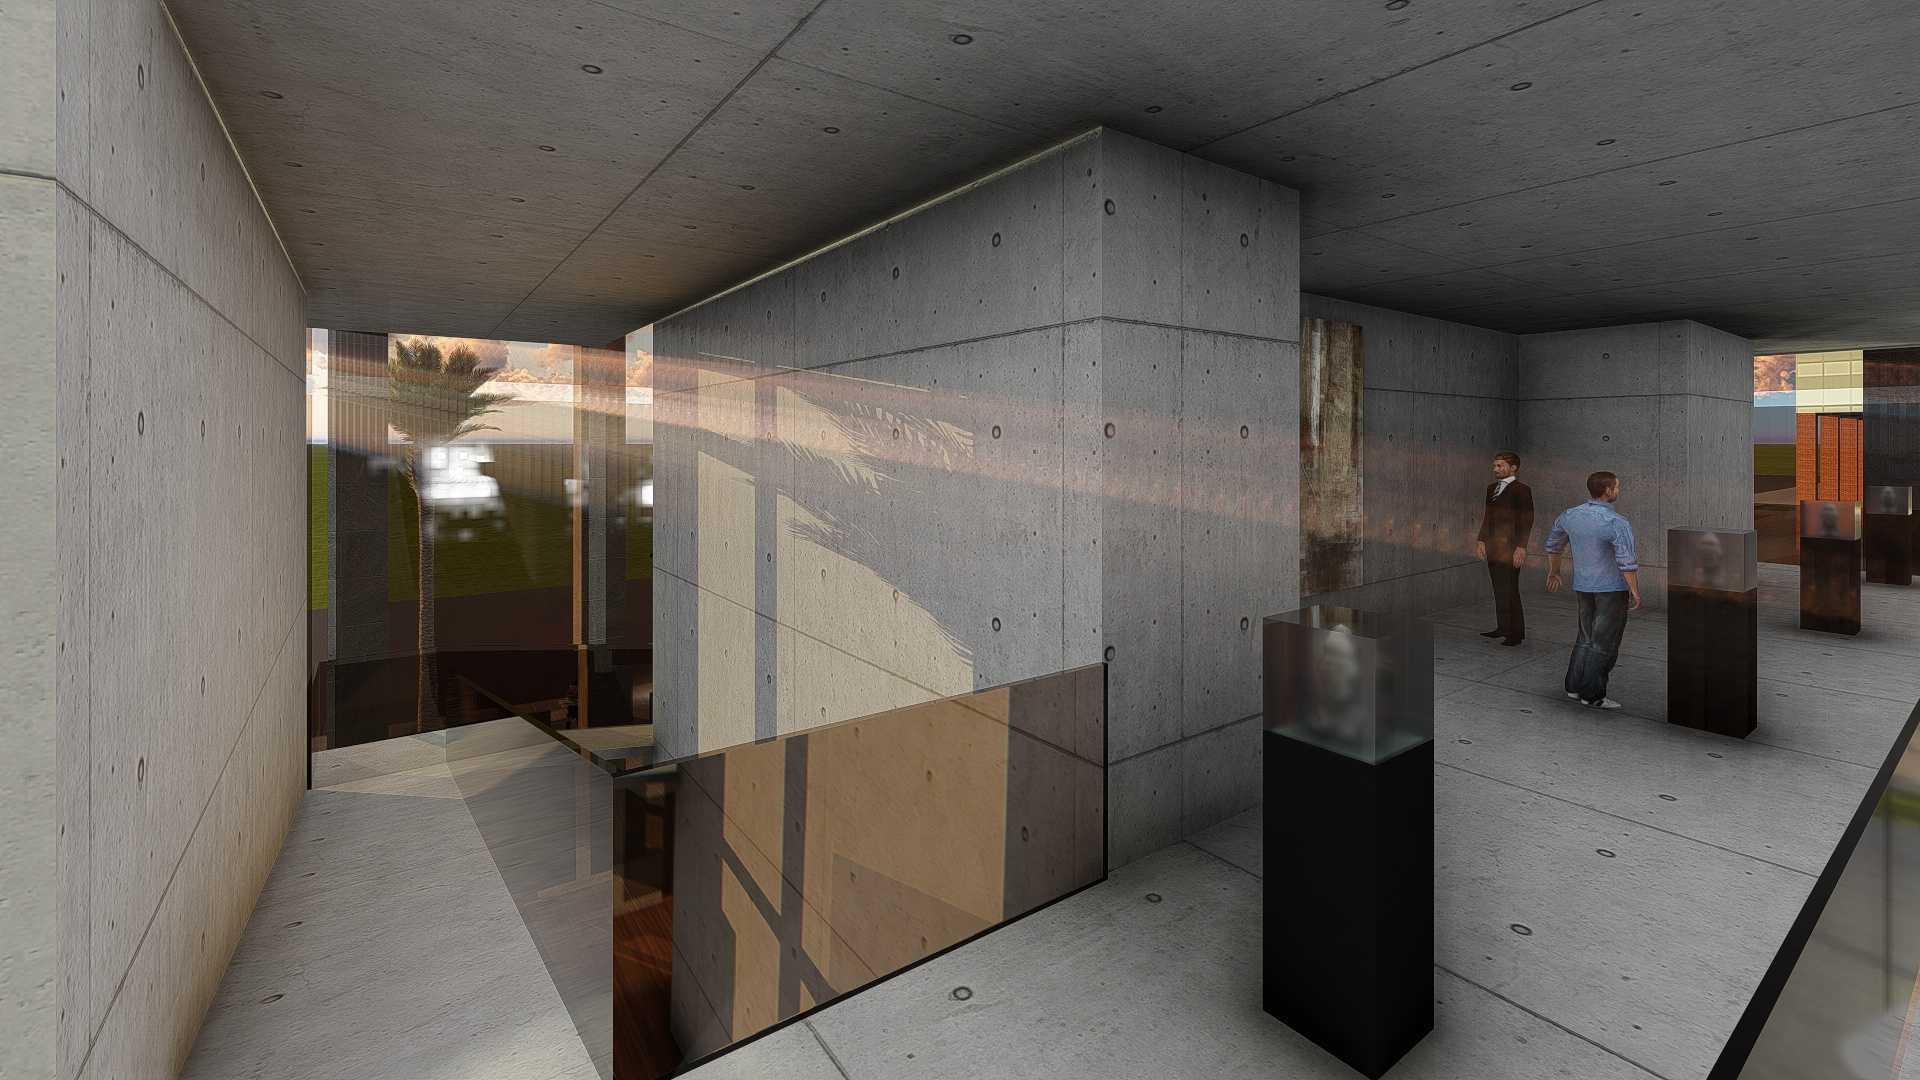 Samitrayasa Design Art Gallery Bogor Bogor, Jawa Barat, Indonesia Bogor, Jawa Barat, Indonesia Display Area 2Nd Floor Minimalist  39070